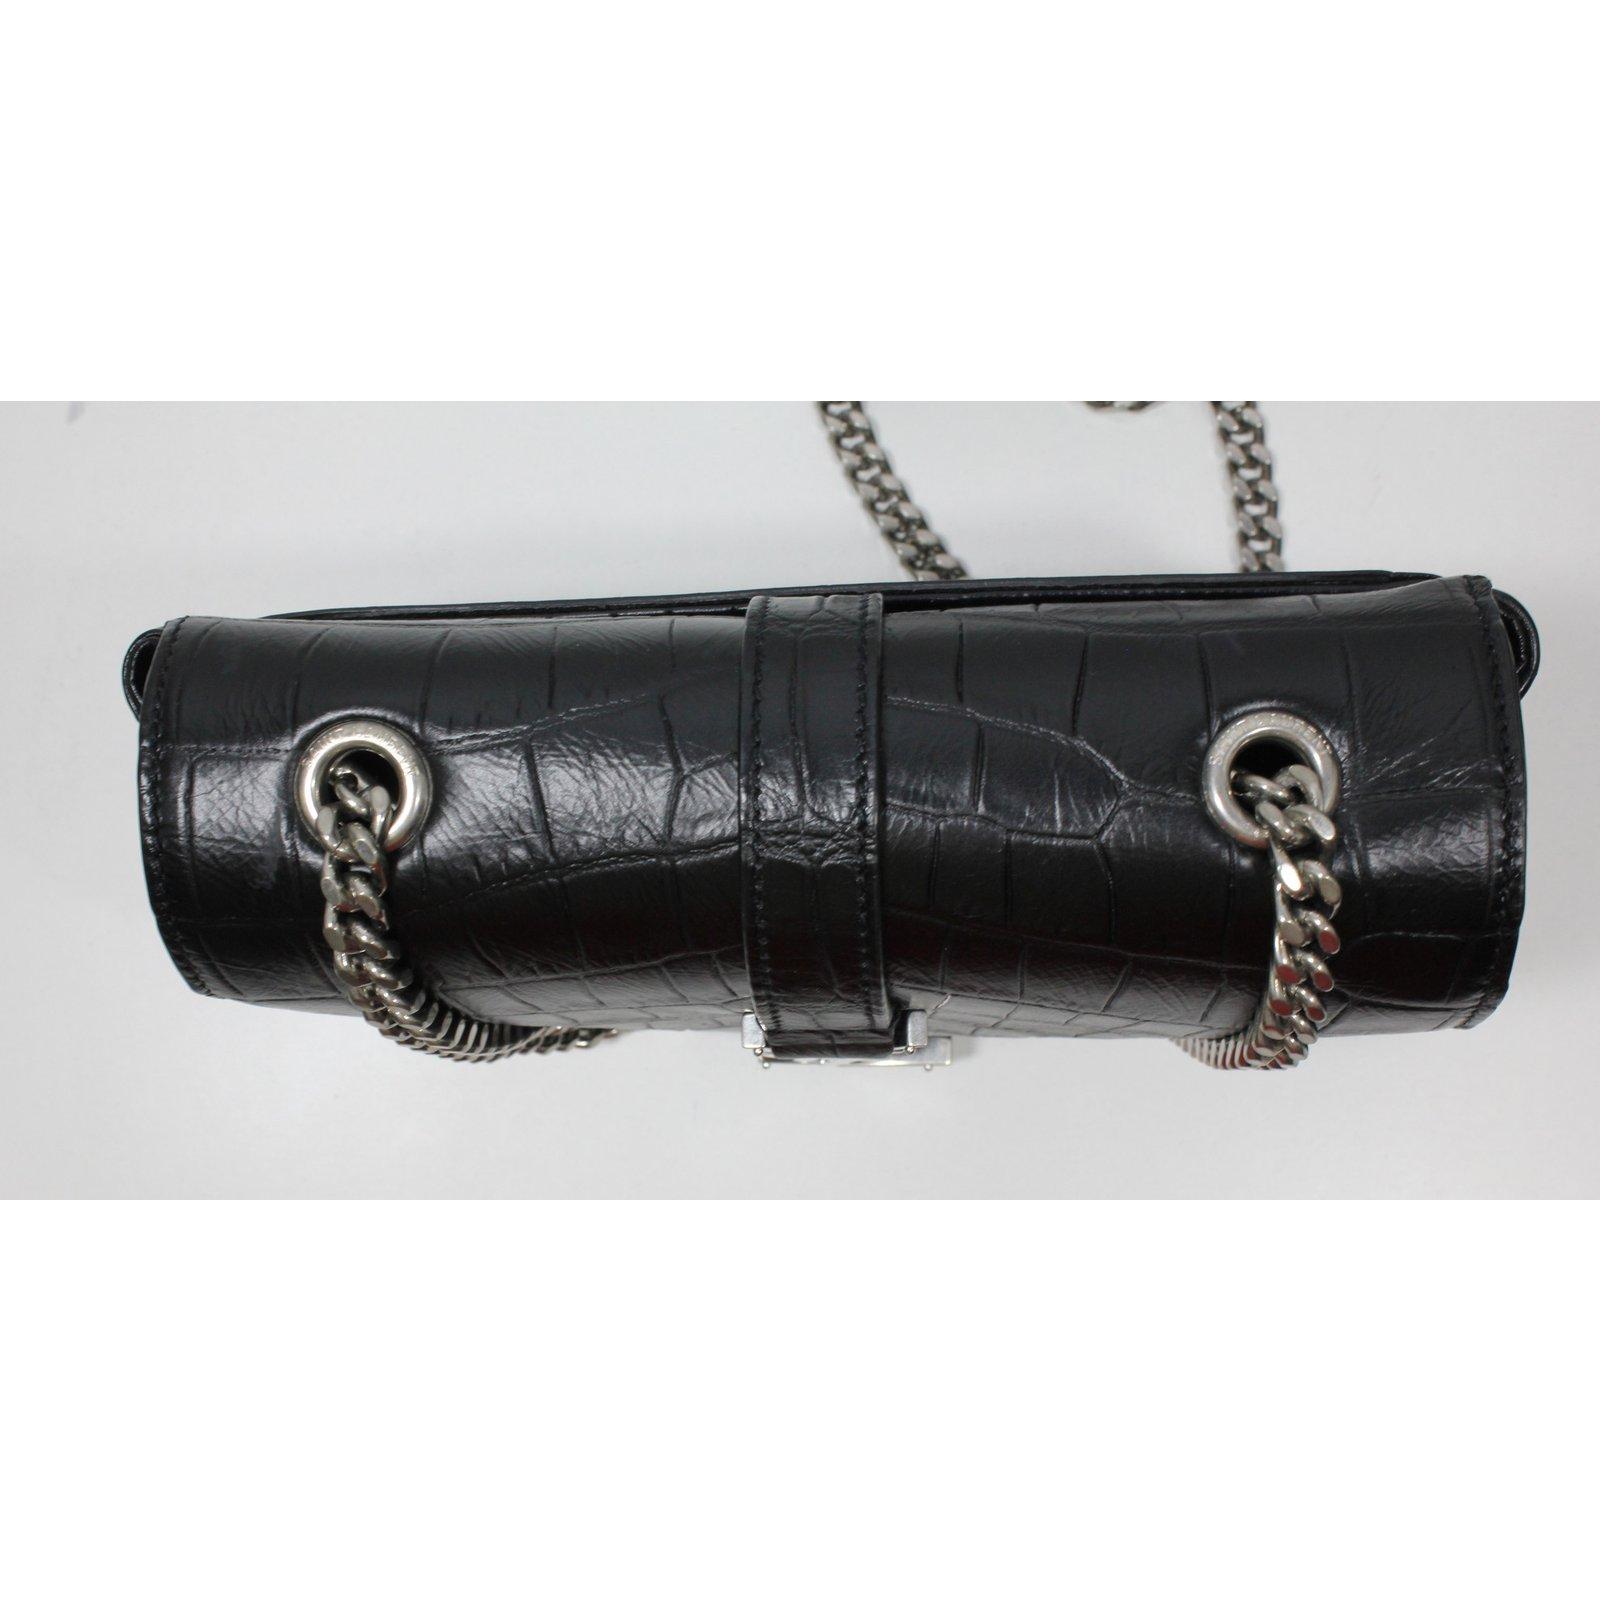 4885aba2c8 Yves Saint Laurent Baby Satchel Handbags Leather Black ref.23202 - Joli  Closet